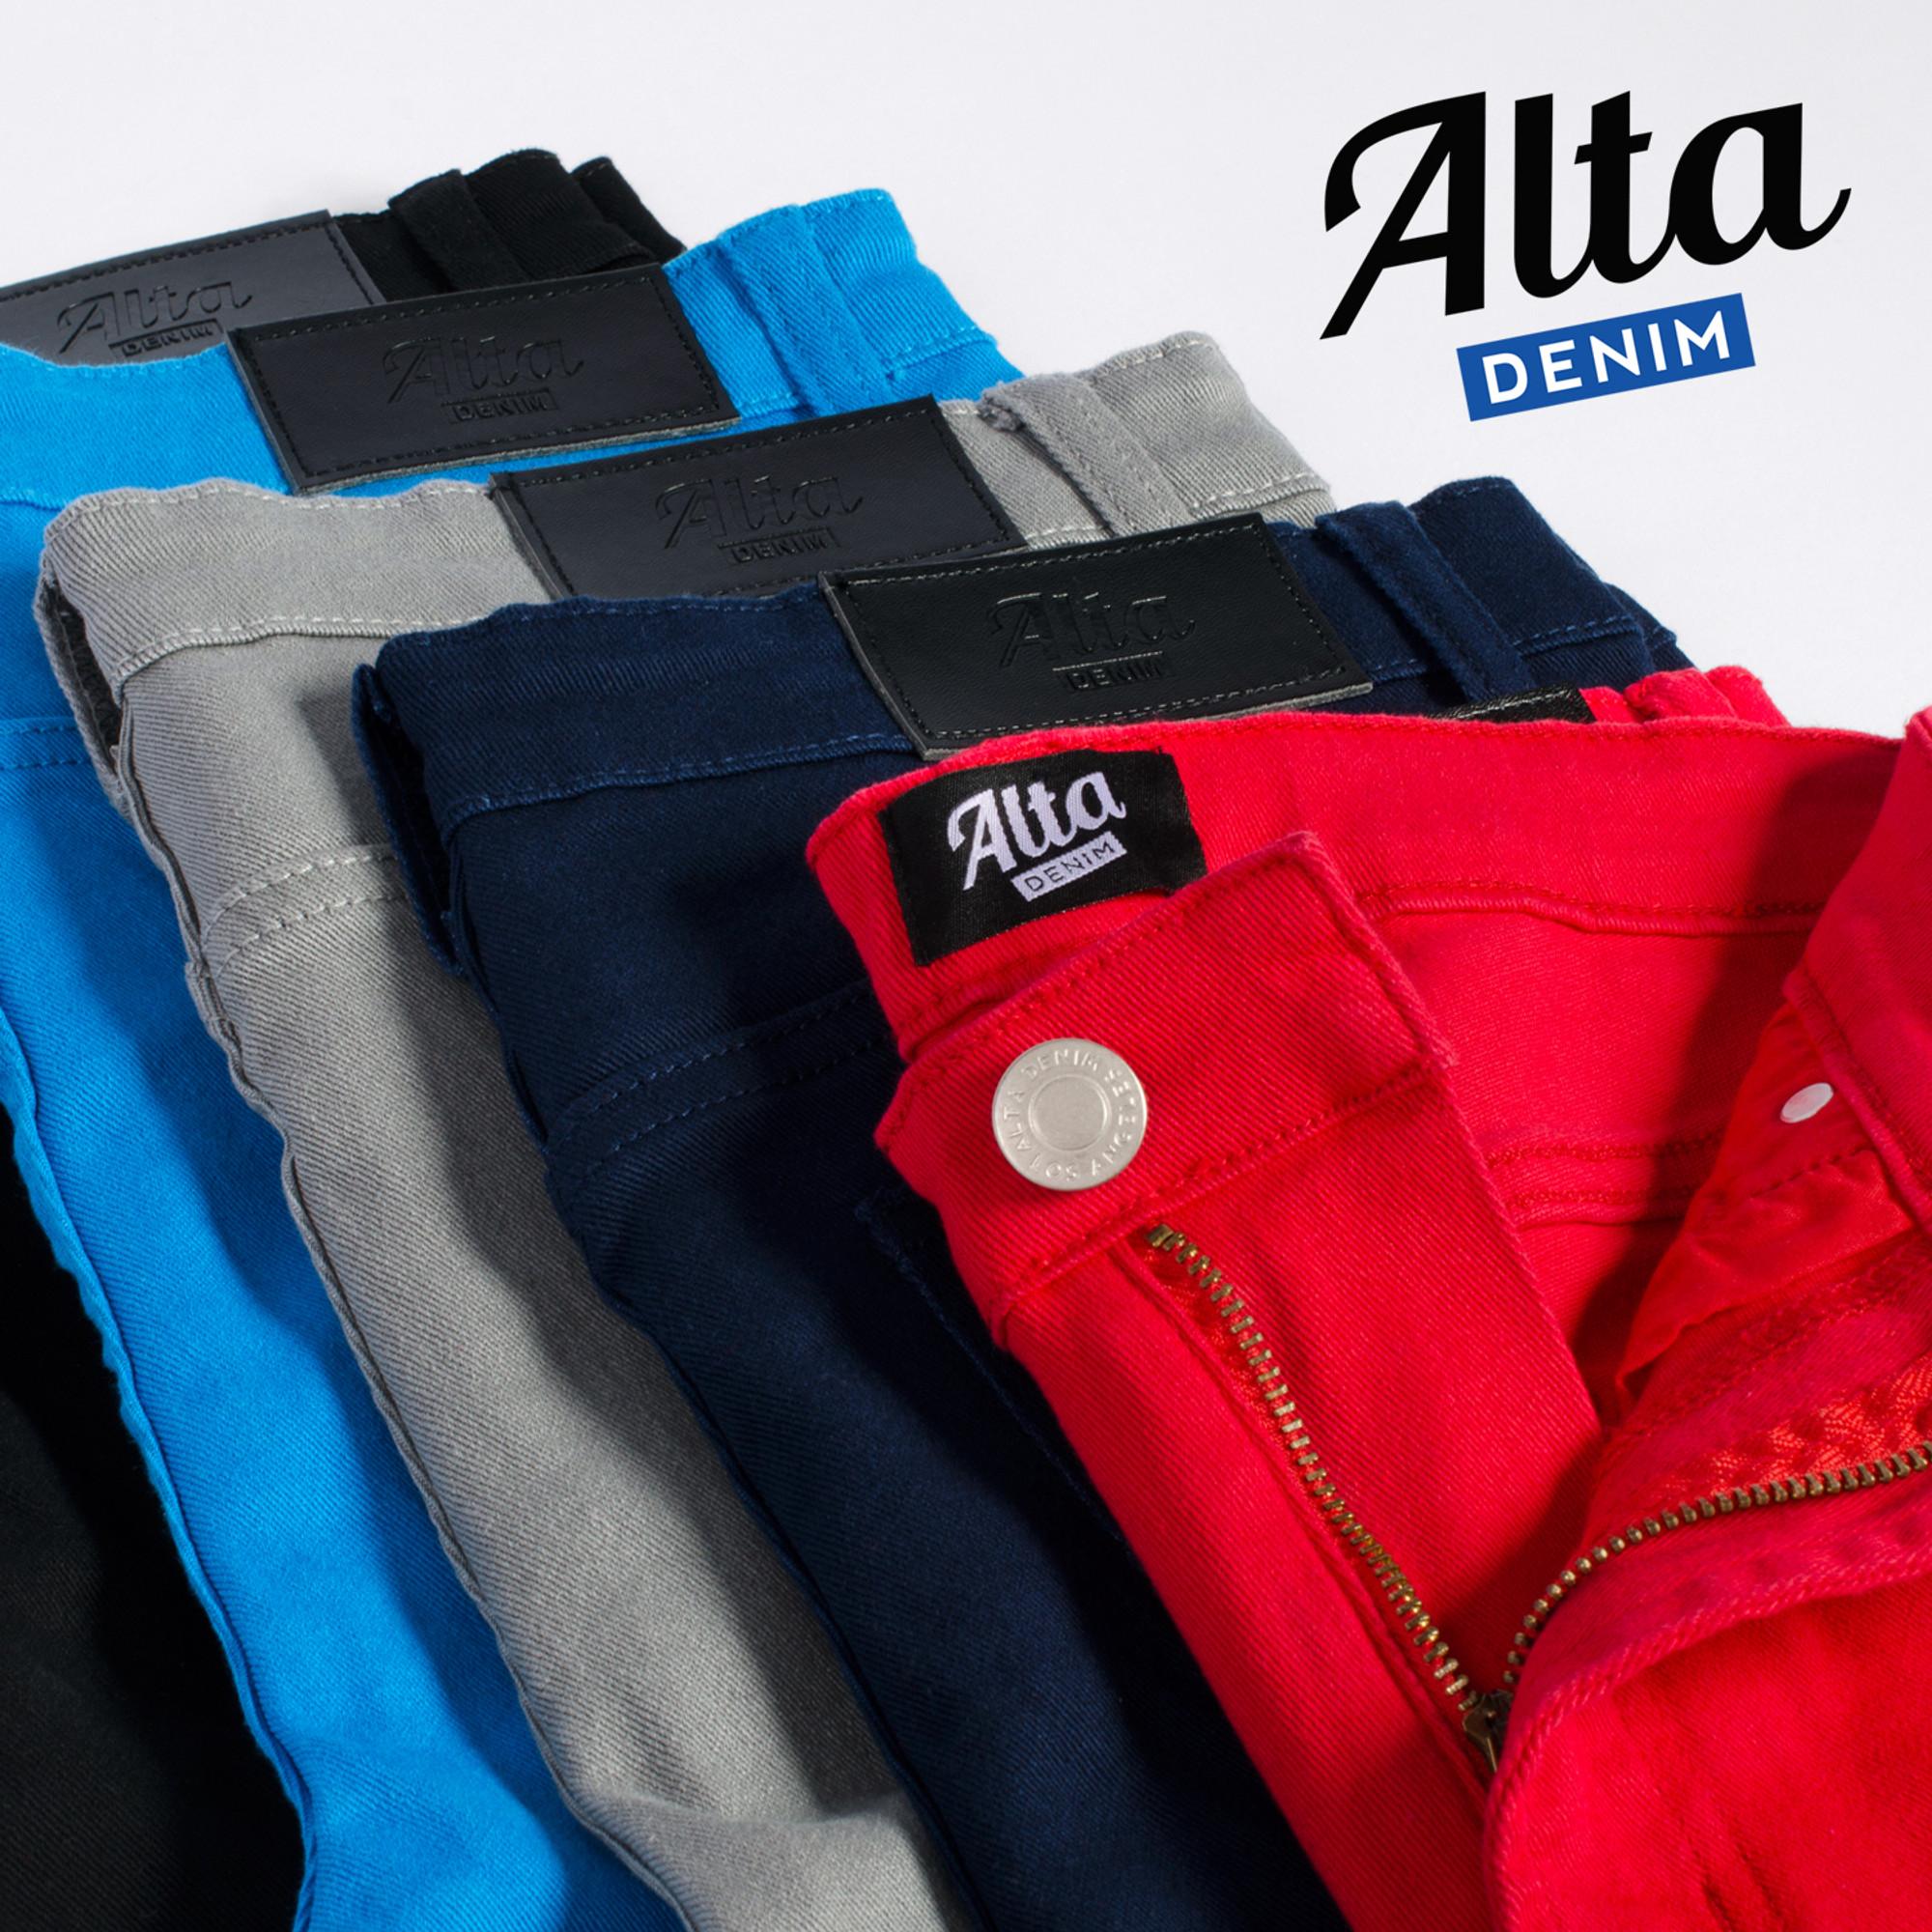 cdb8a2671b0 Alta Designer Fashion Mens Slim Fit Skinny Denim Jeans - Multiple Colors &  Sizes